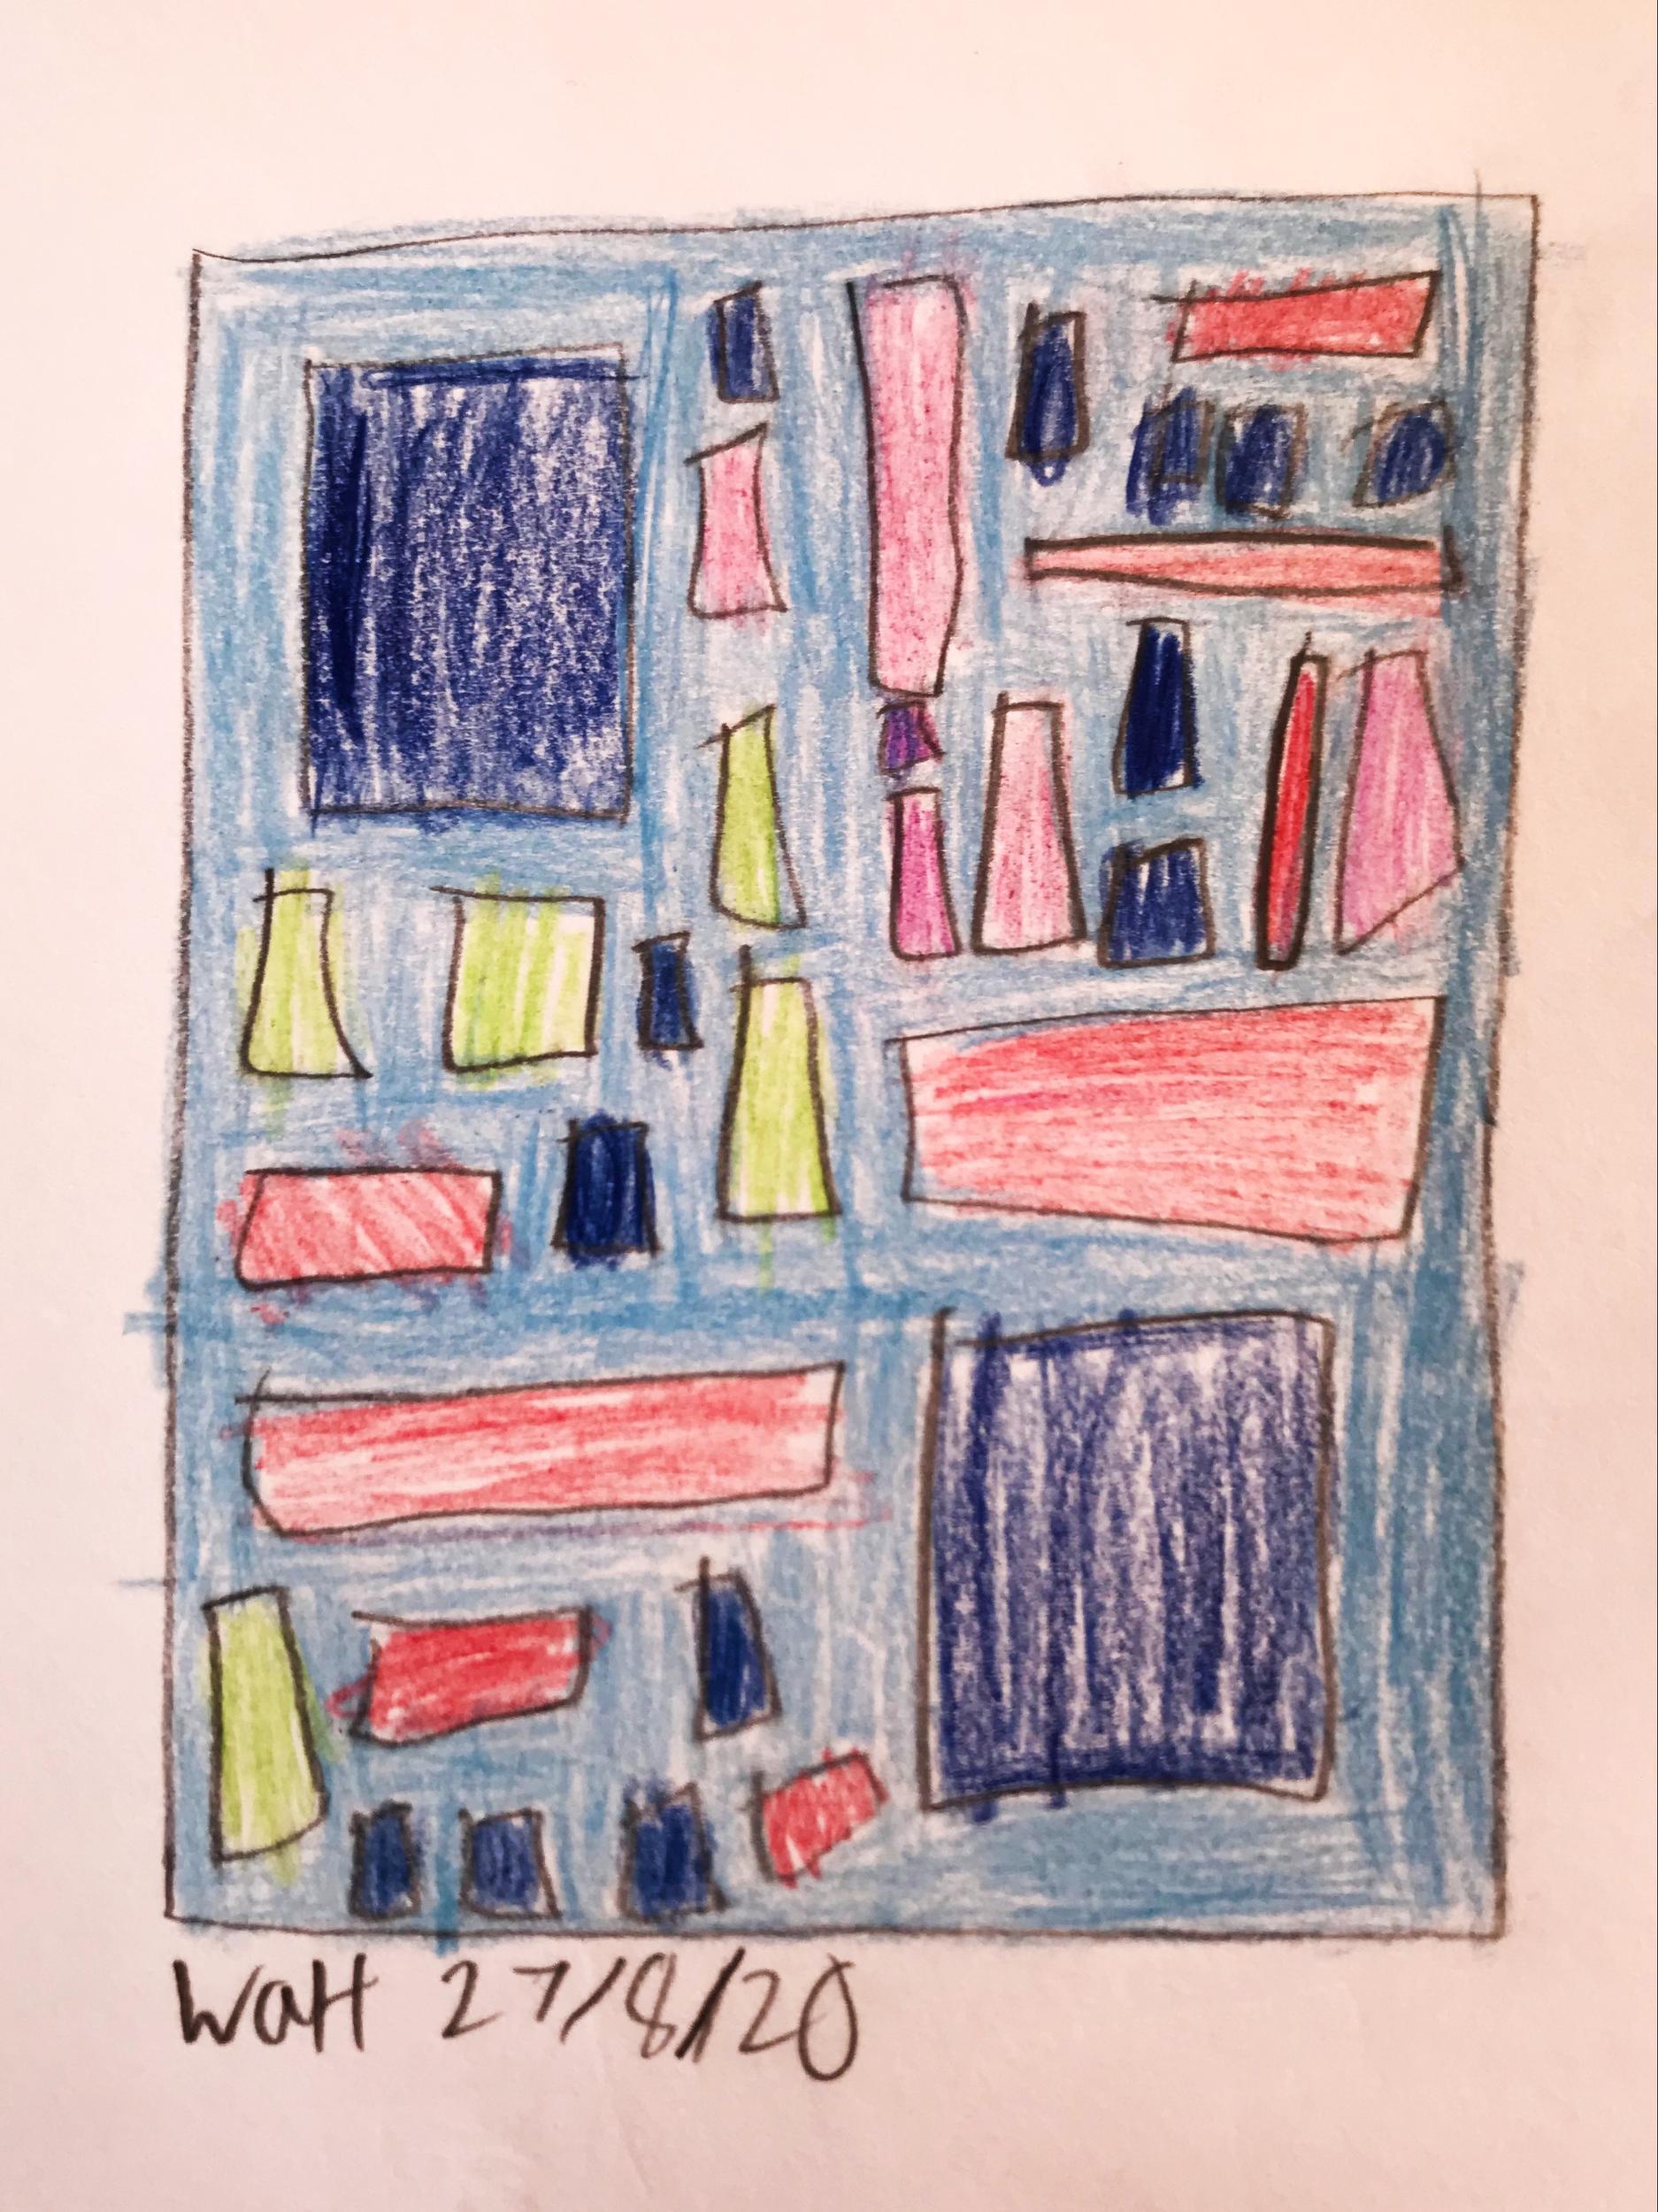 A hand drawn image of a bookshelf made by an art club member